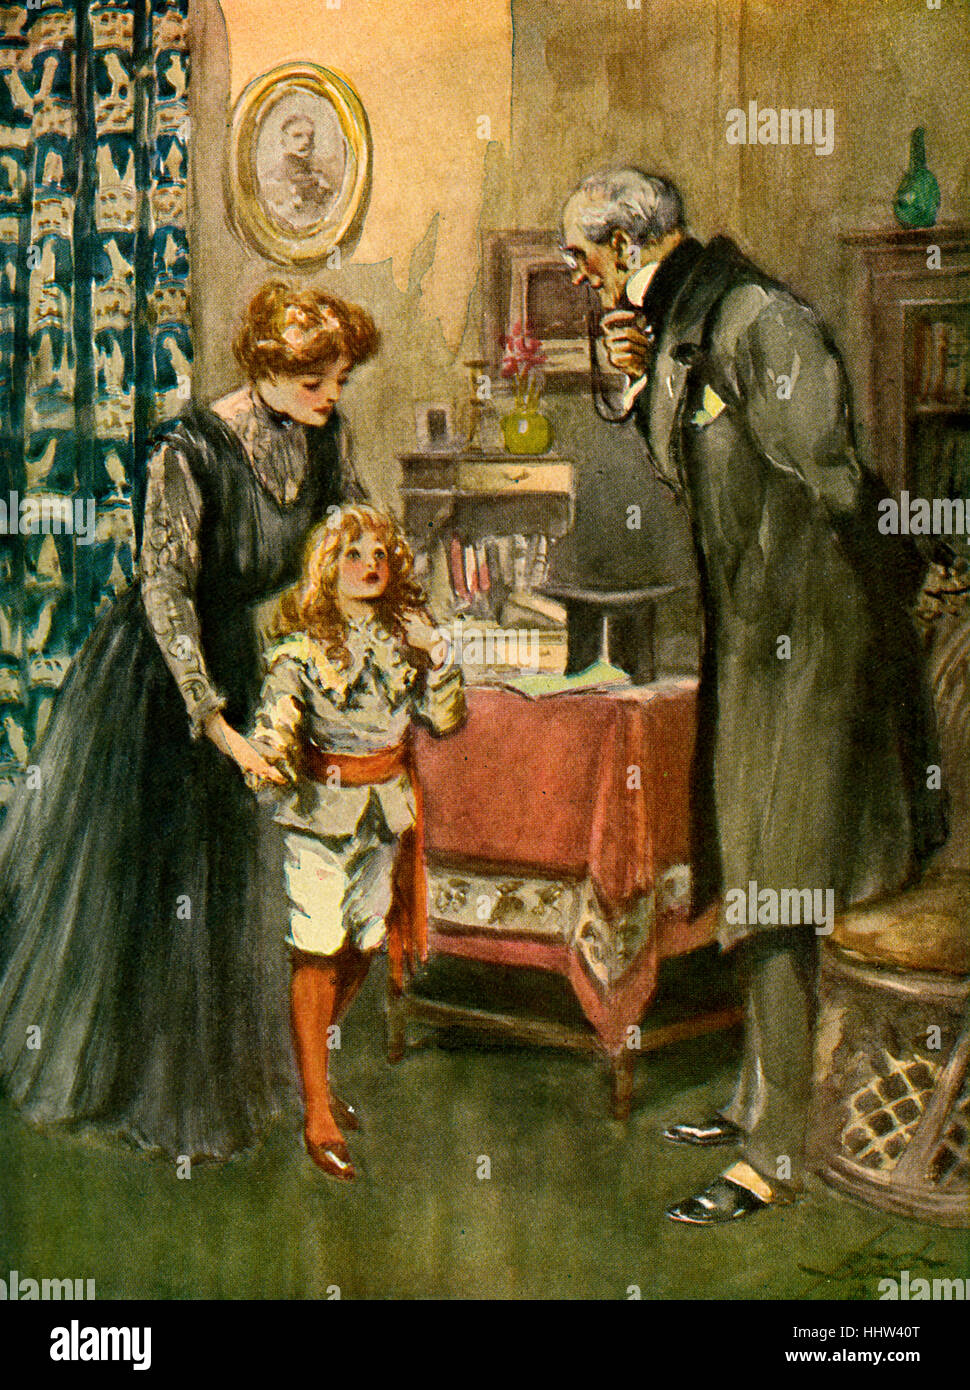 Little Lord Fauntleroy By Frances Hodgson Burnett Caption Reads So Stock Photo Alamy